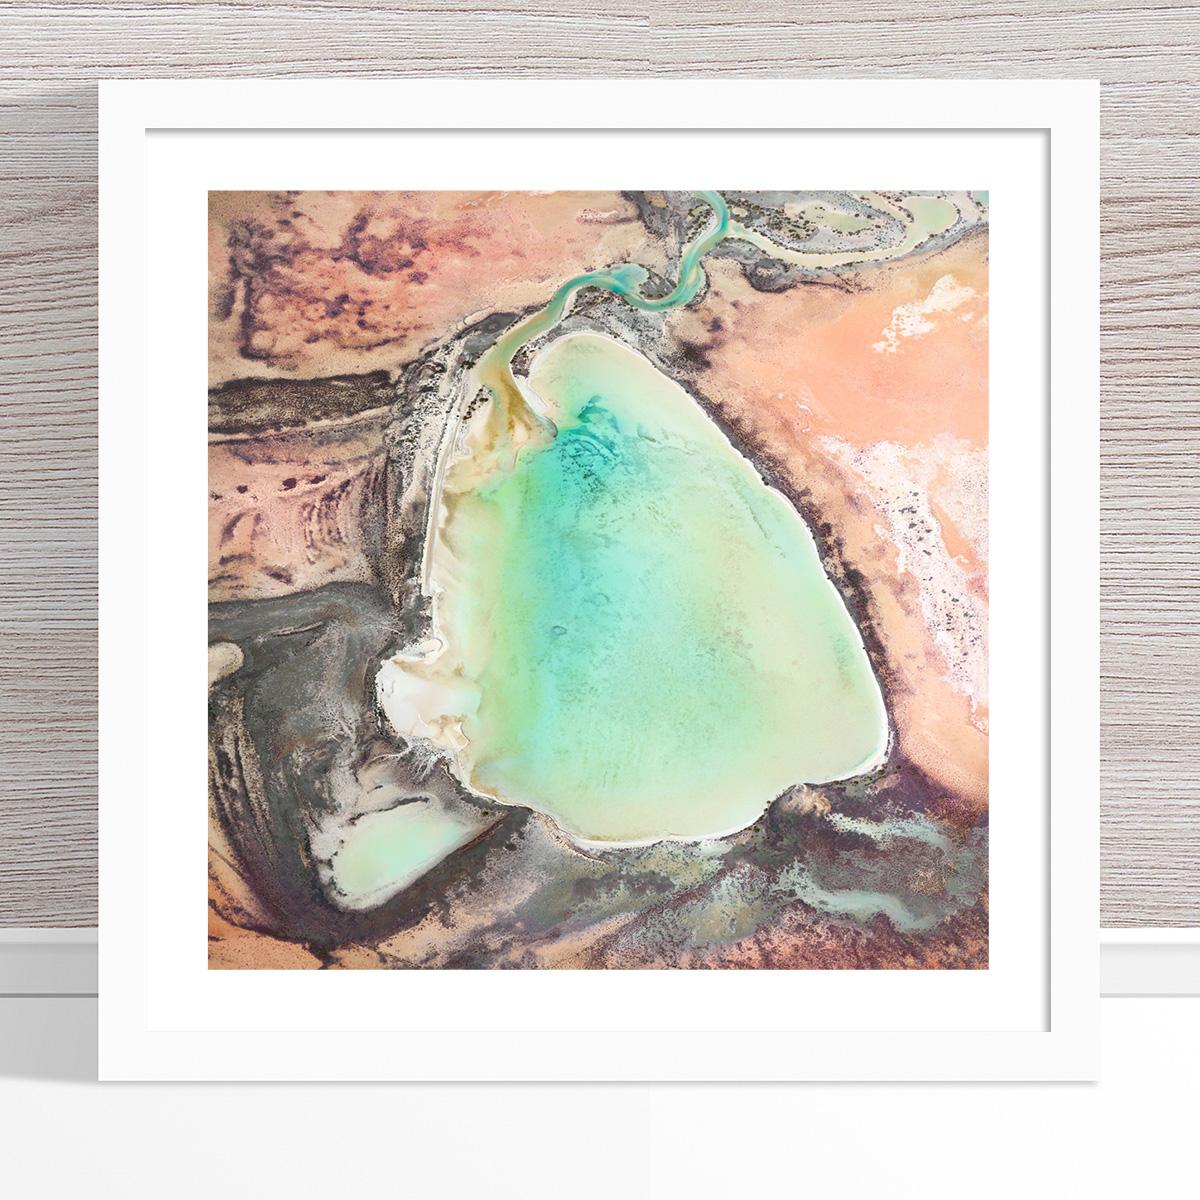 Chris Saunders - 'Aerial Outback 005' White Frame